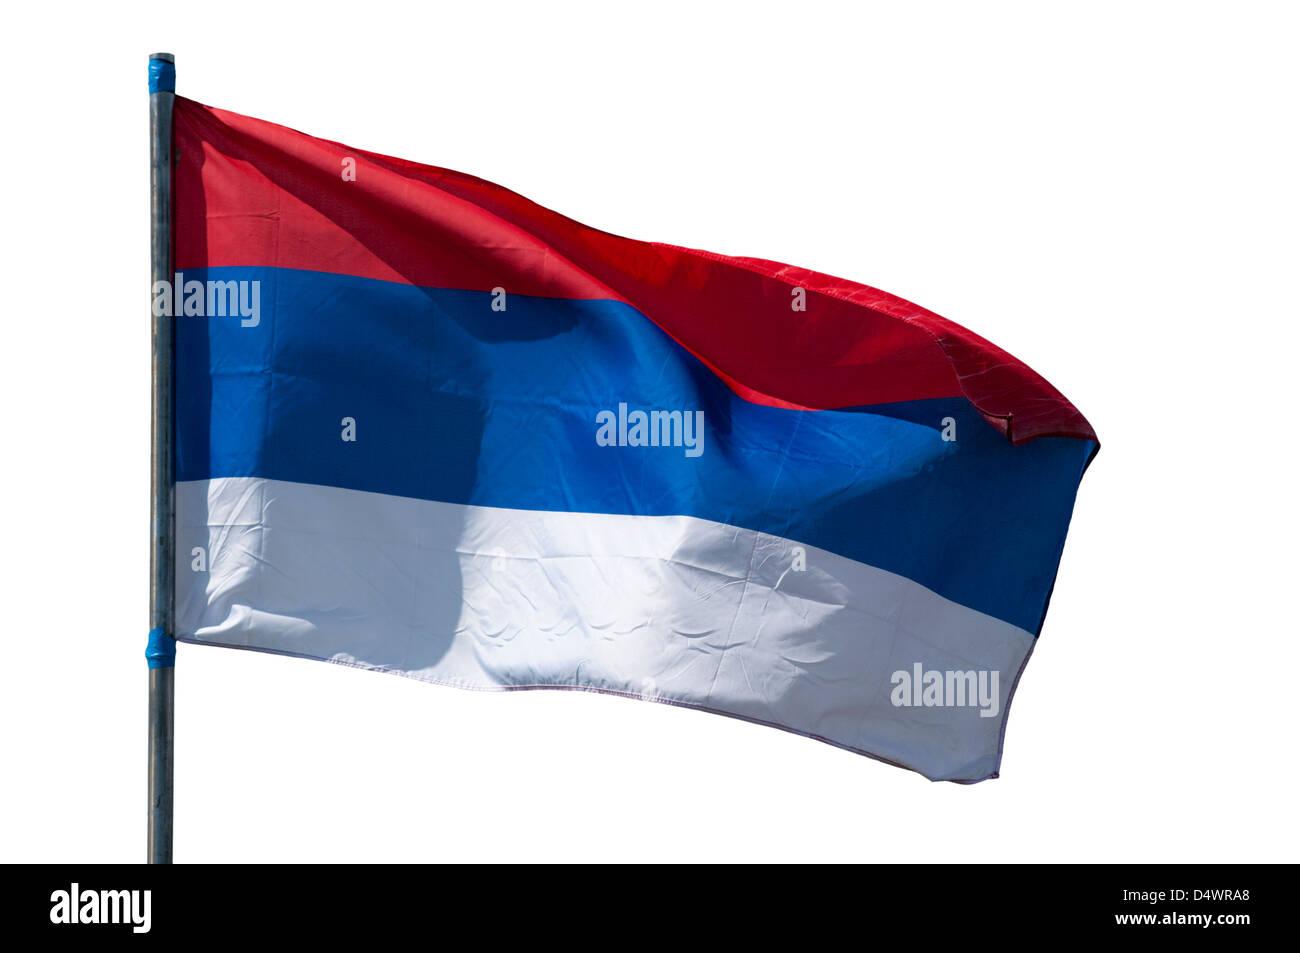 Serbian national flag - Stock Image